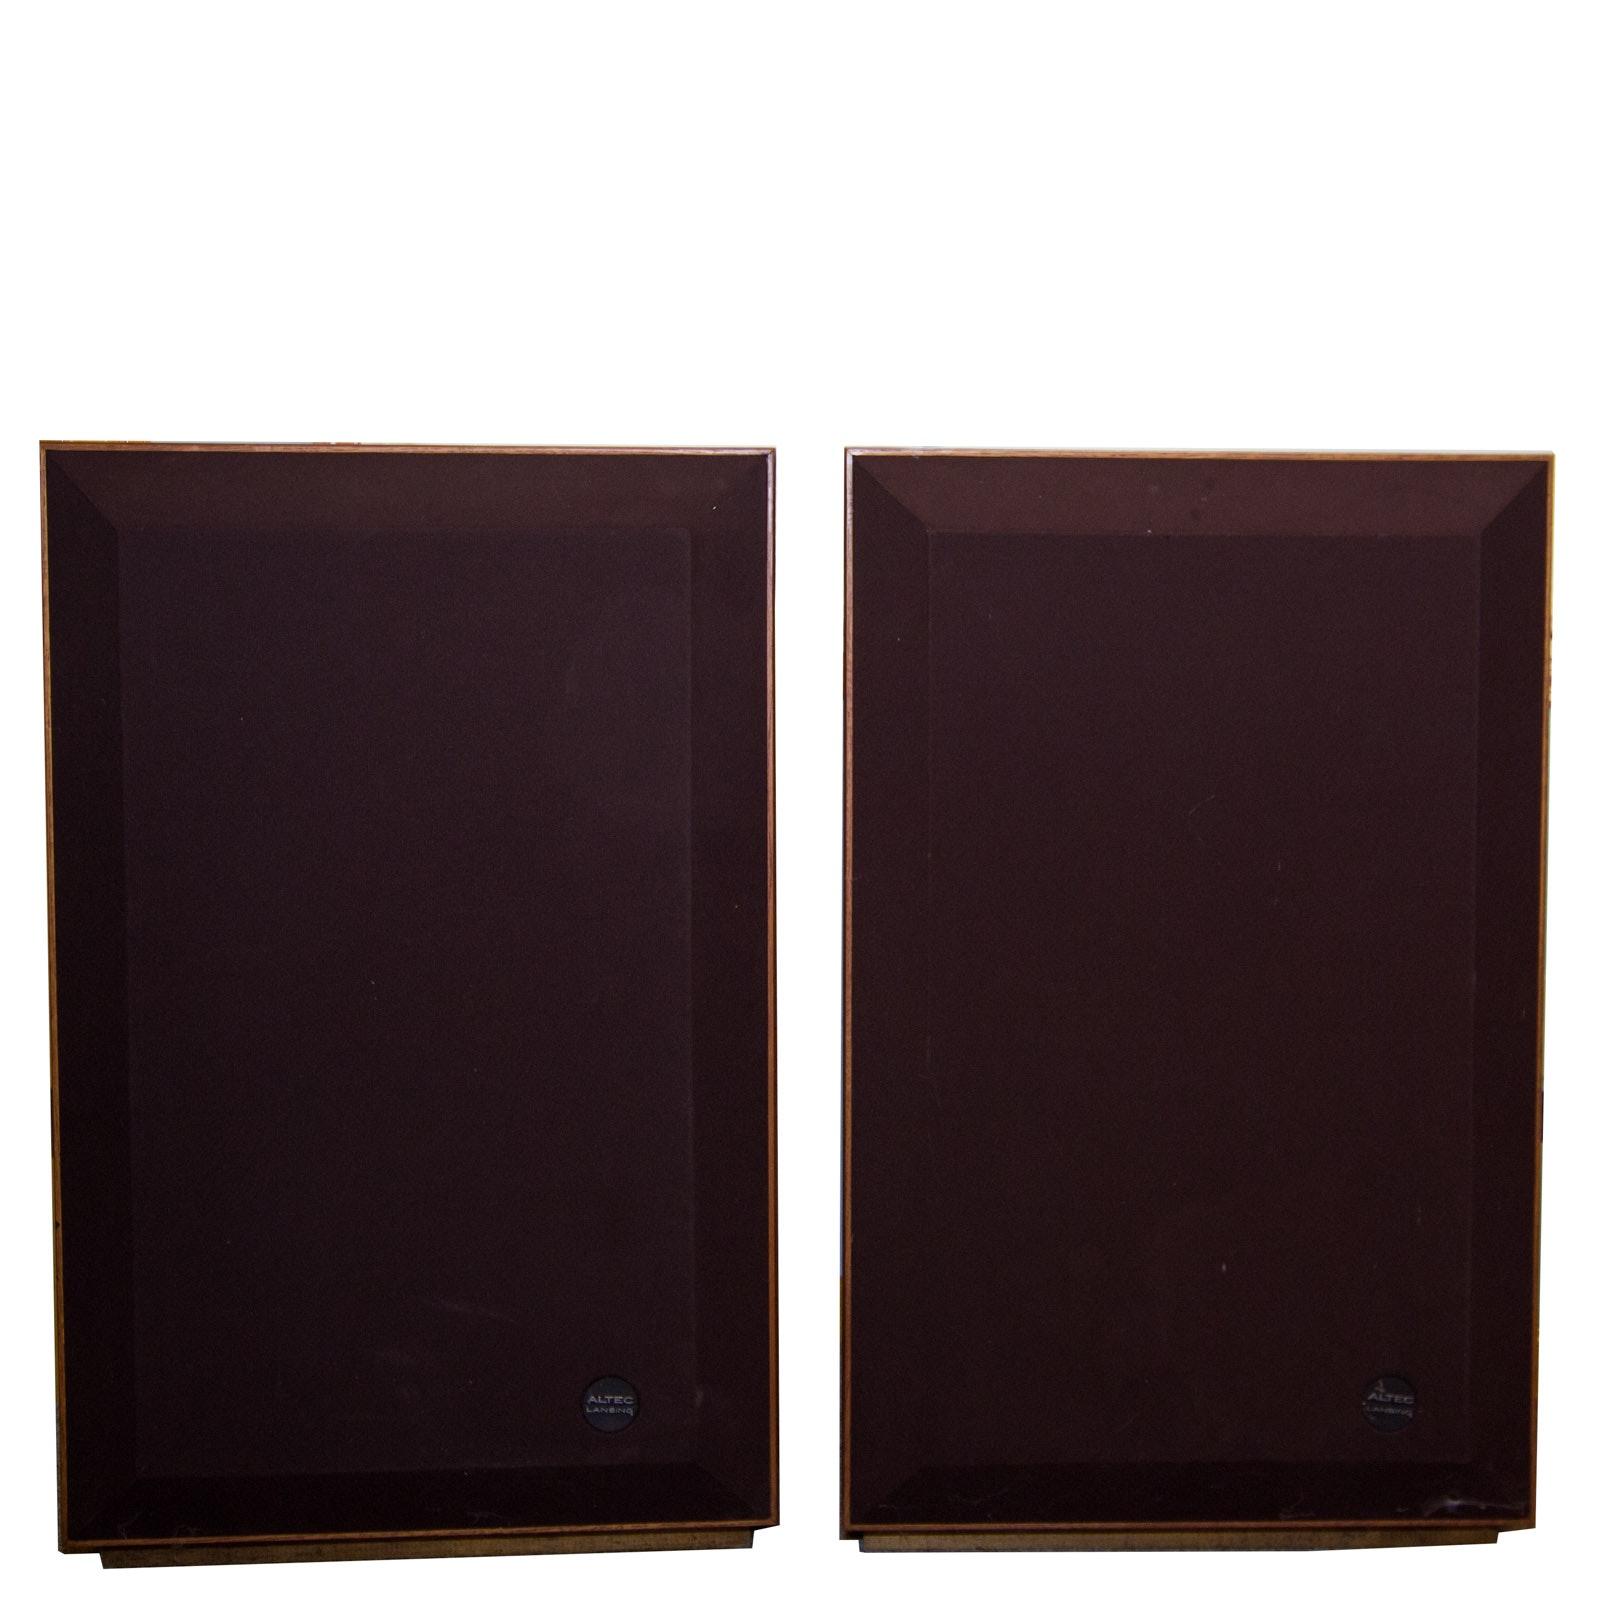 Pair of Altec Lansing Model 17 Speakers